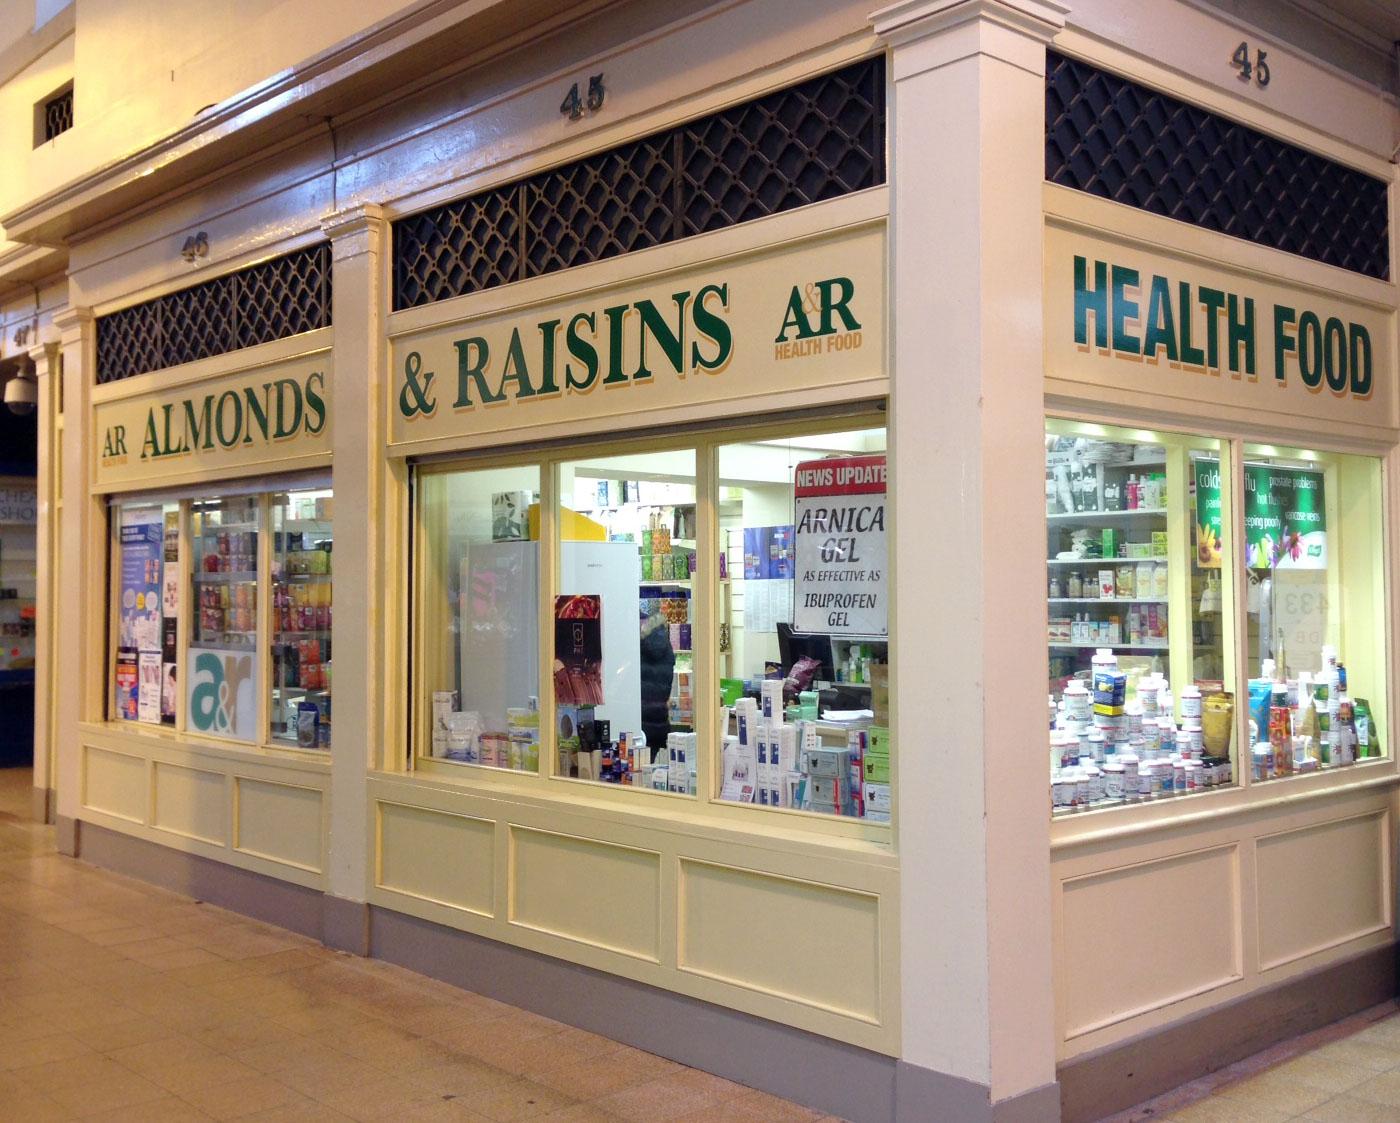 Almonds & Raisins Health Foods